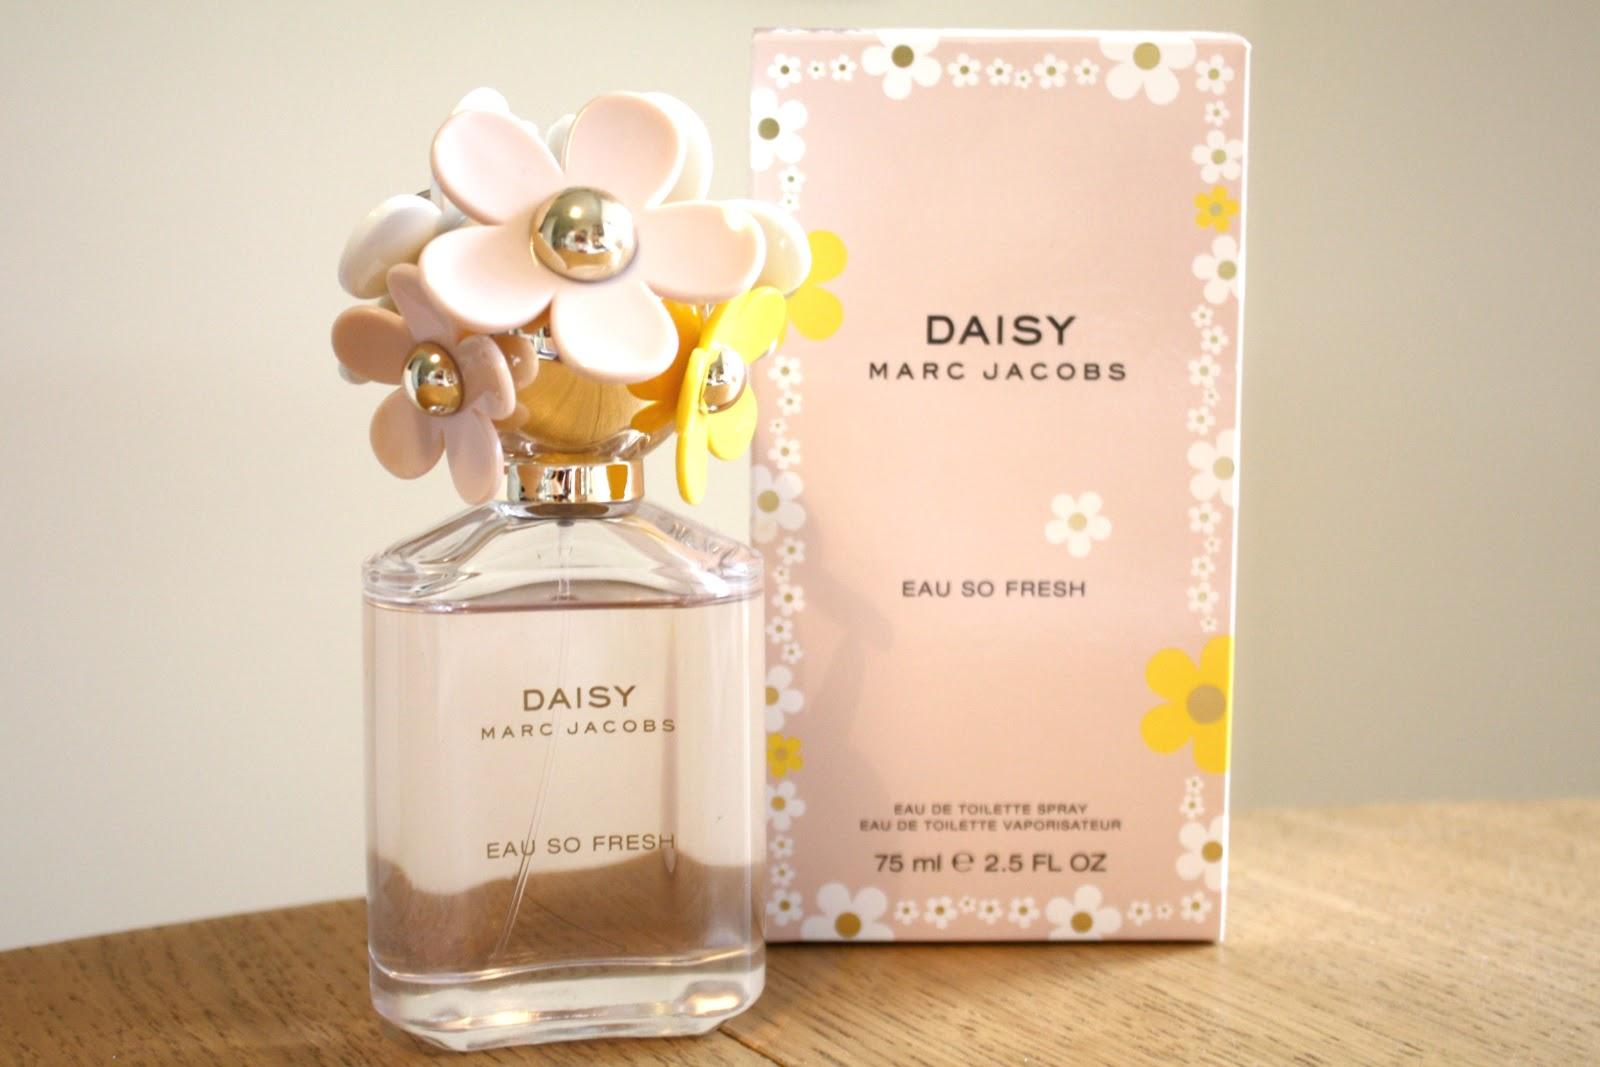 marc jacob daisy eau so fresh review pic. Black Bedroom Furniture Sets. Home Design Ideas